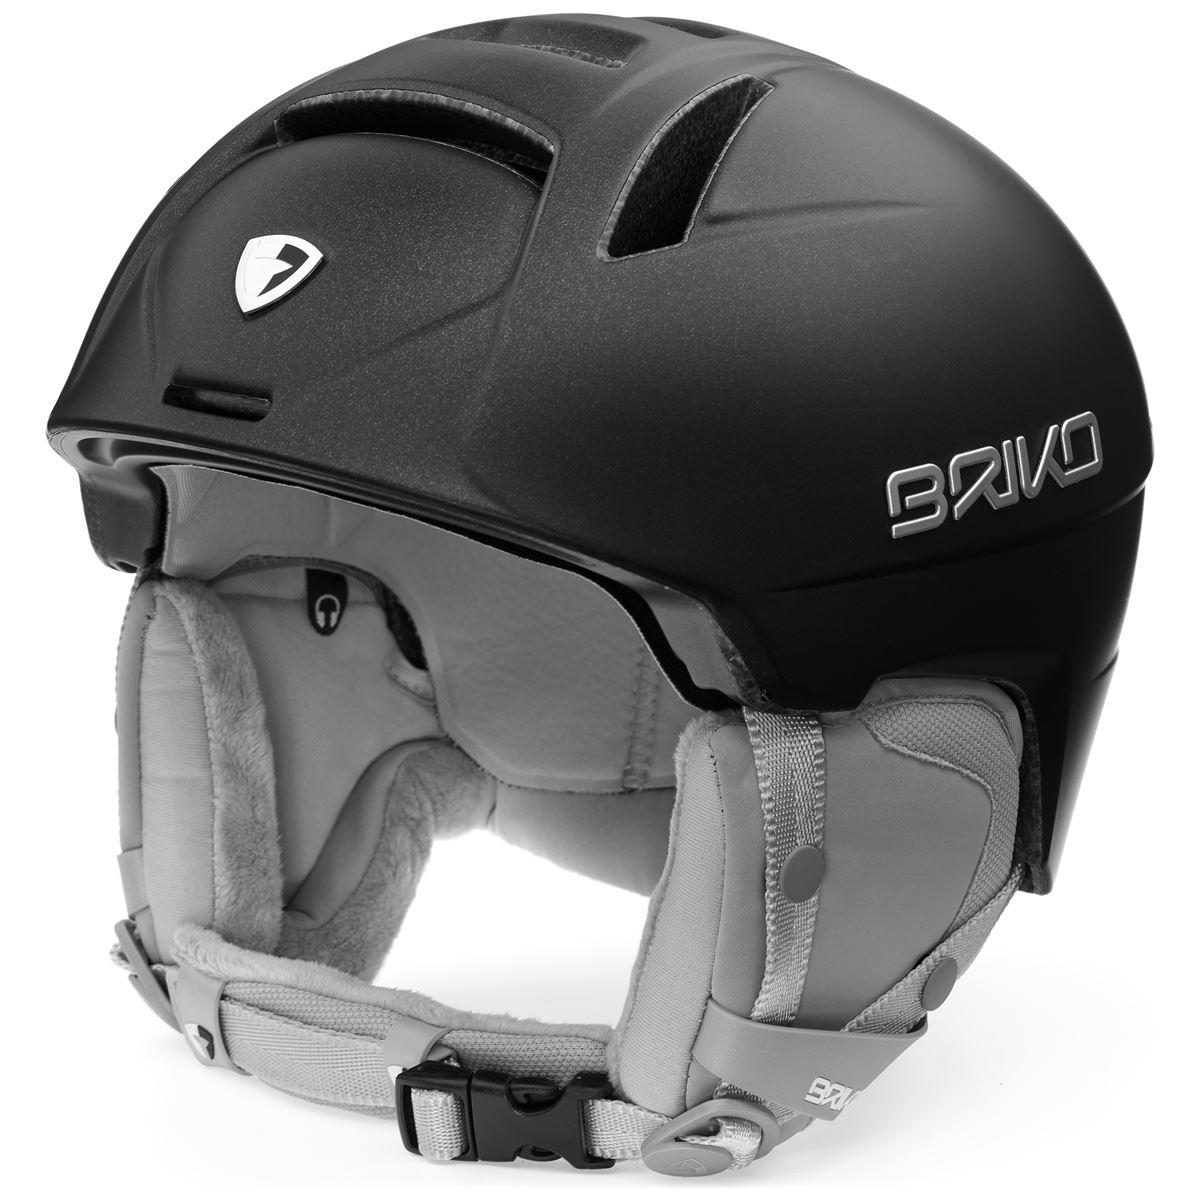 Snowboard Helmet -  briko PERLA